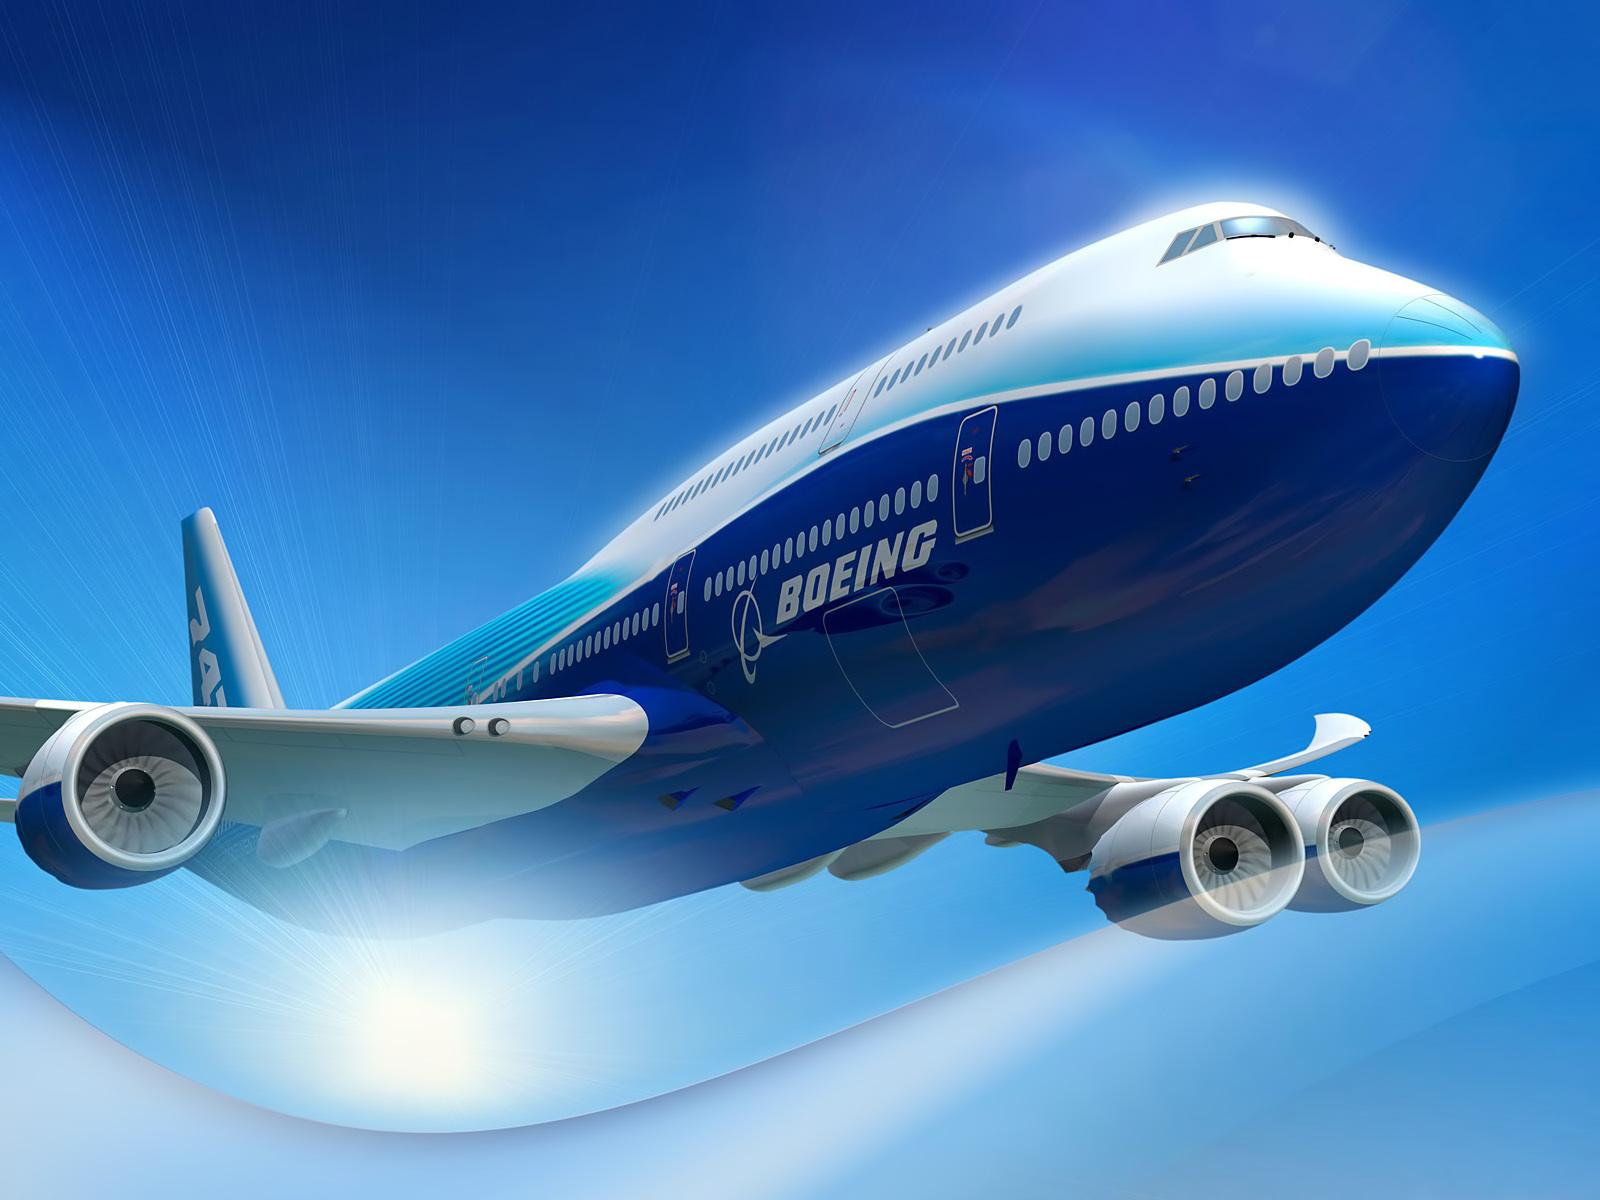 Boeing desktop wallpaper wallpapersafari - Boeing wallpapers for desktop ...